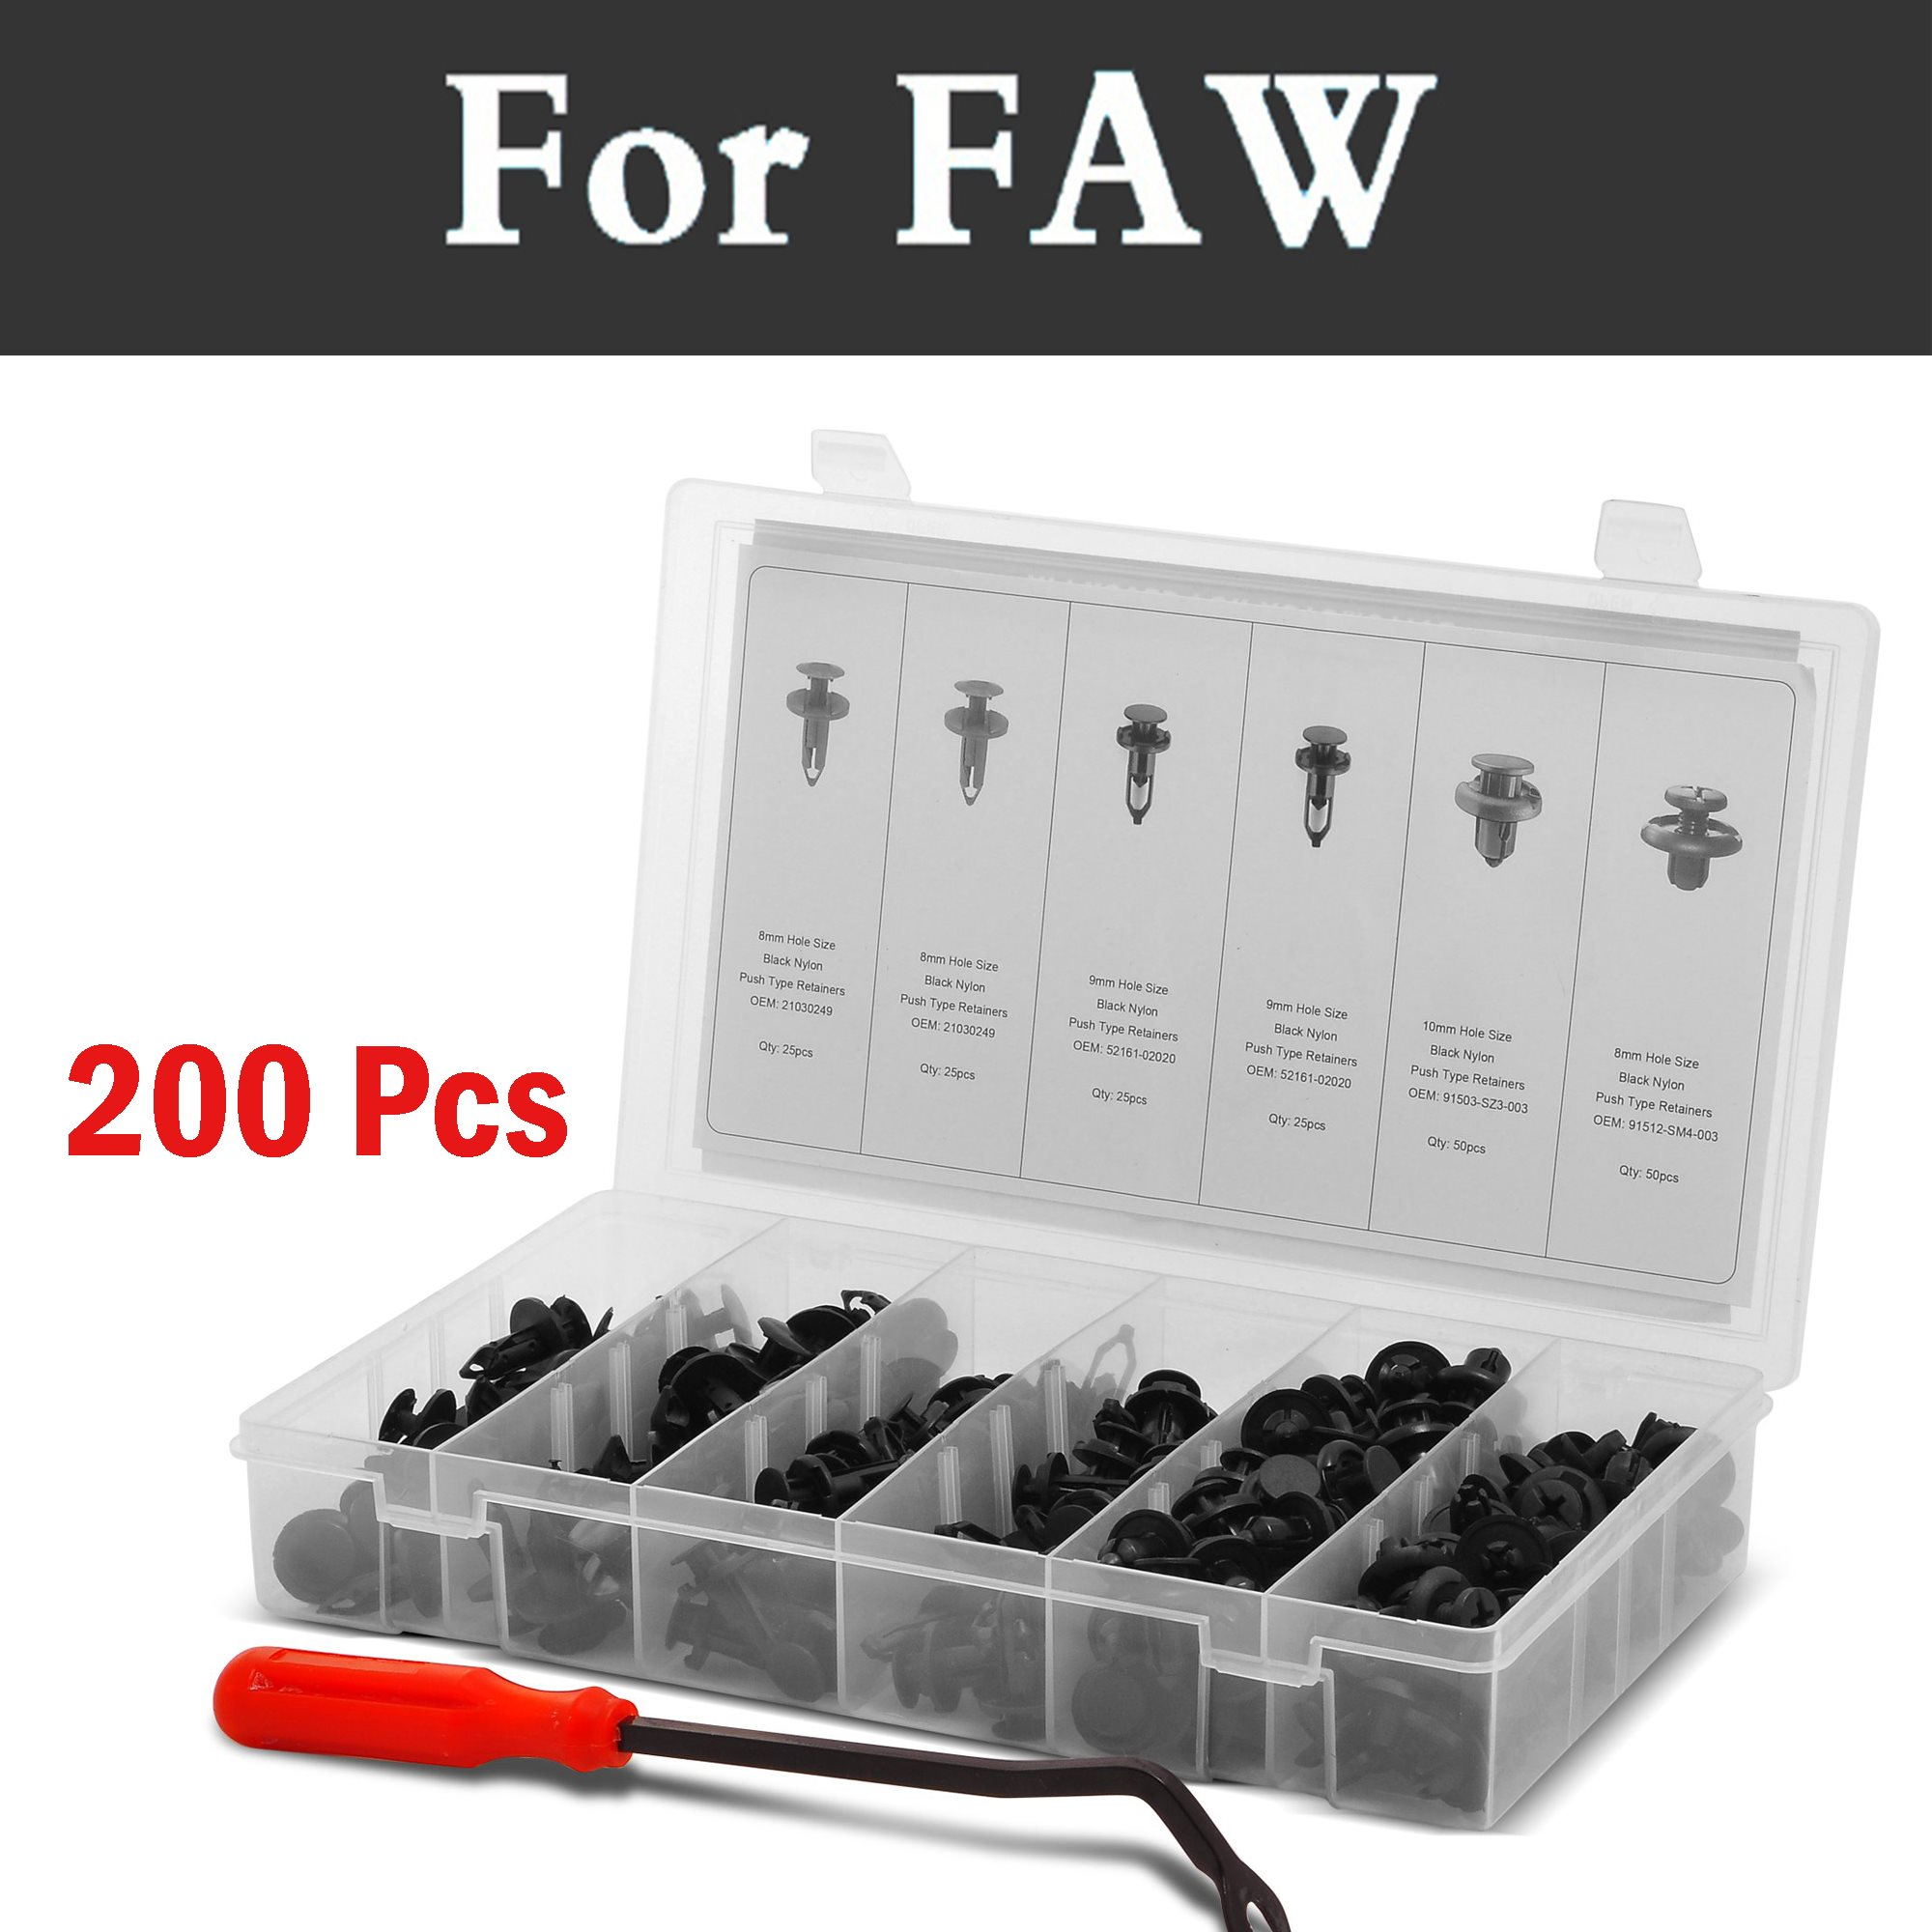 200 pcs Bumper Push Pin Rivet Empurre Retentor Fixadores Kit Se Encaixa Rebites para Faw Besturn B50 B70 X80 Gênios Oley Vita V2 V5